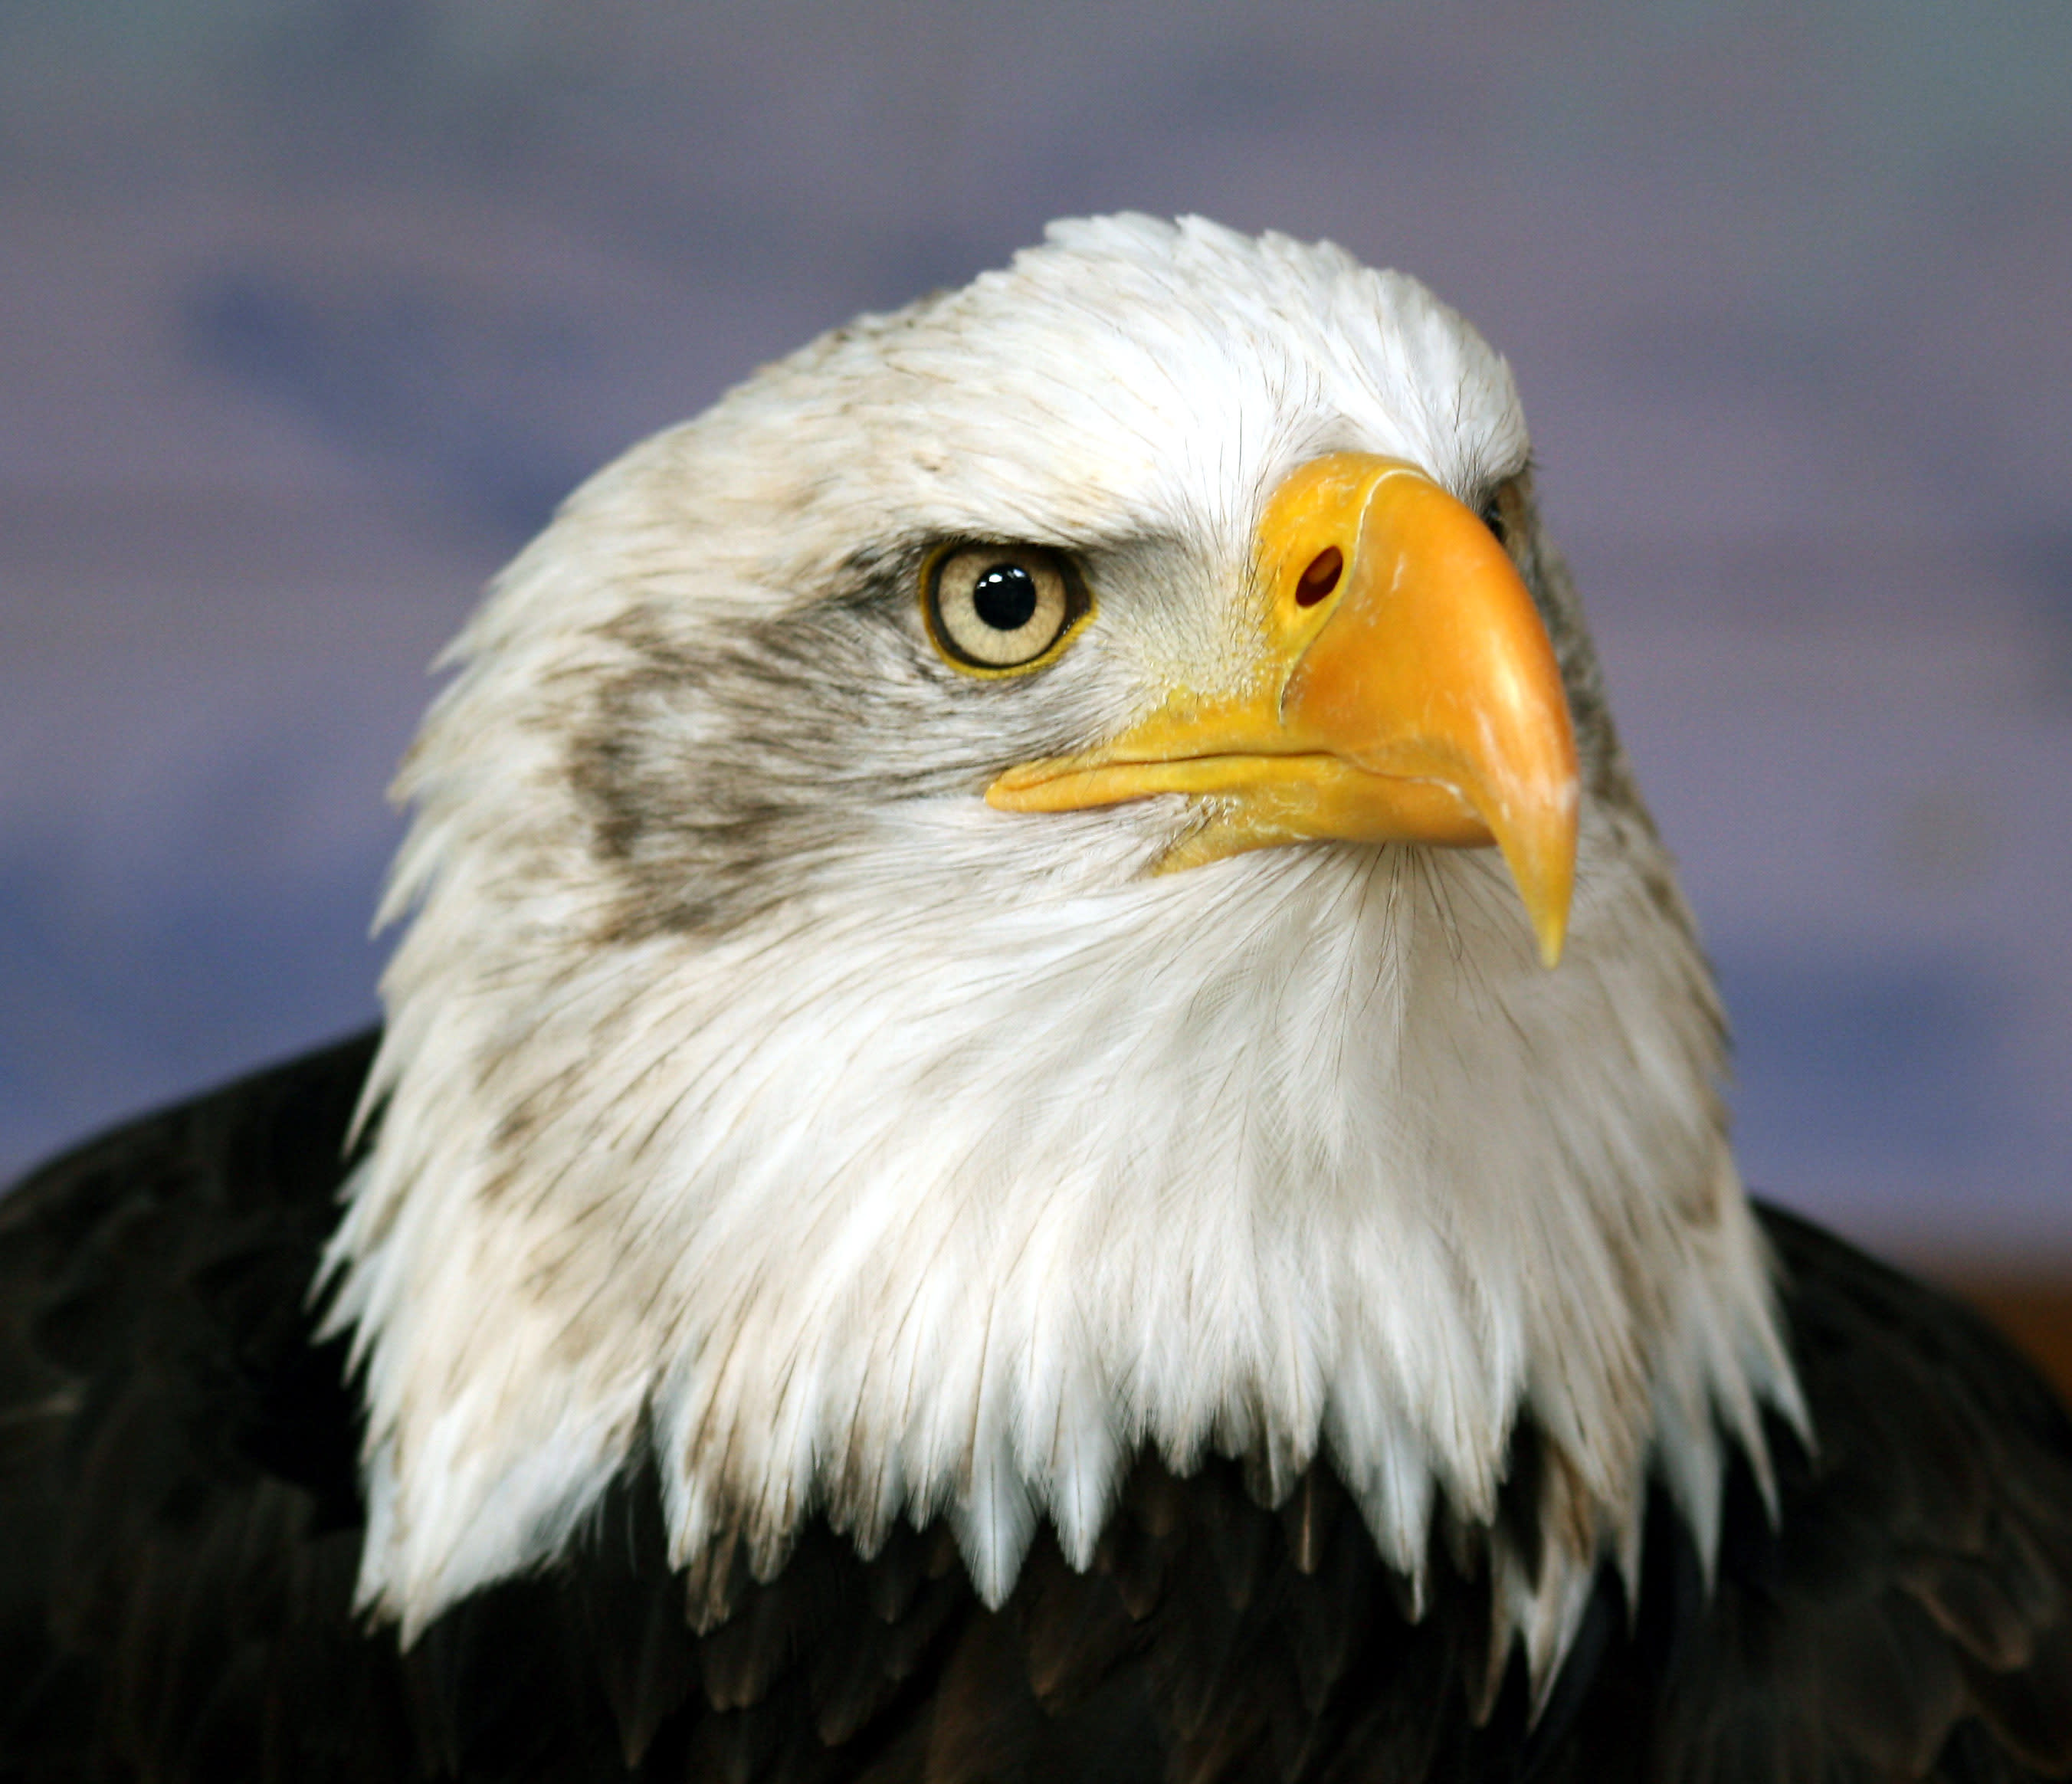 Bald eagle head image